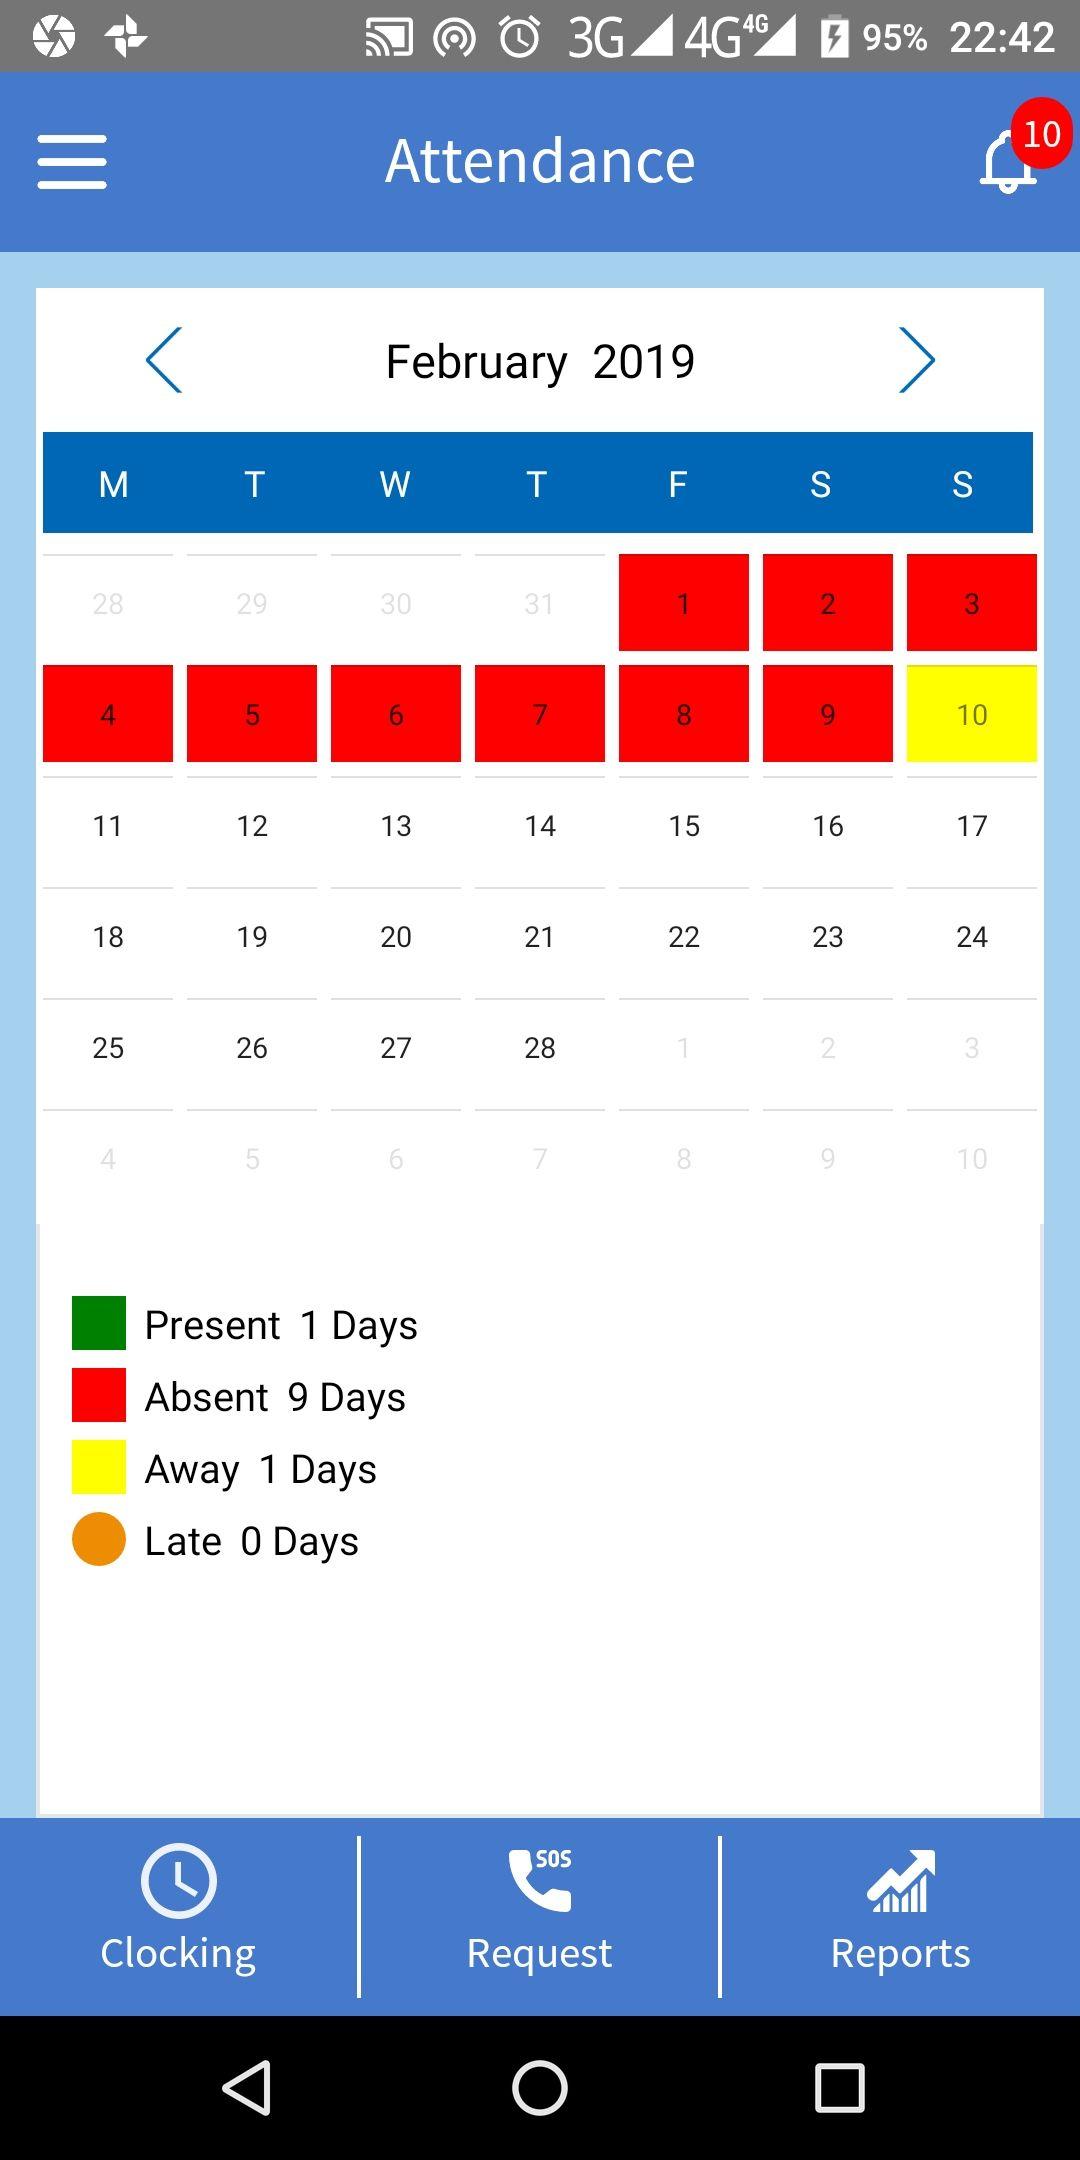 1 Absence Management software Online absence management